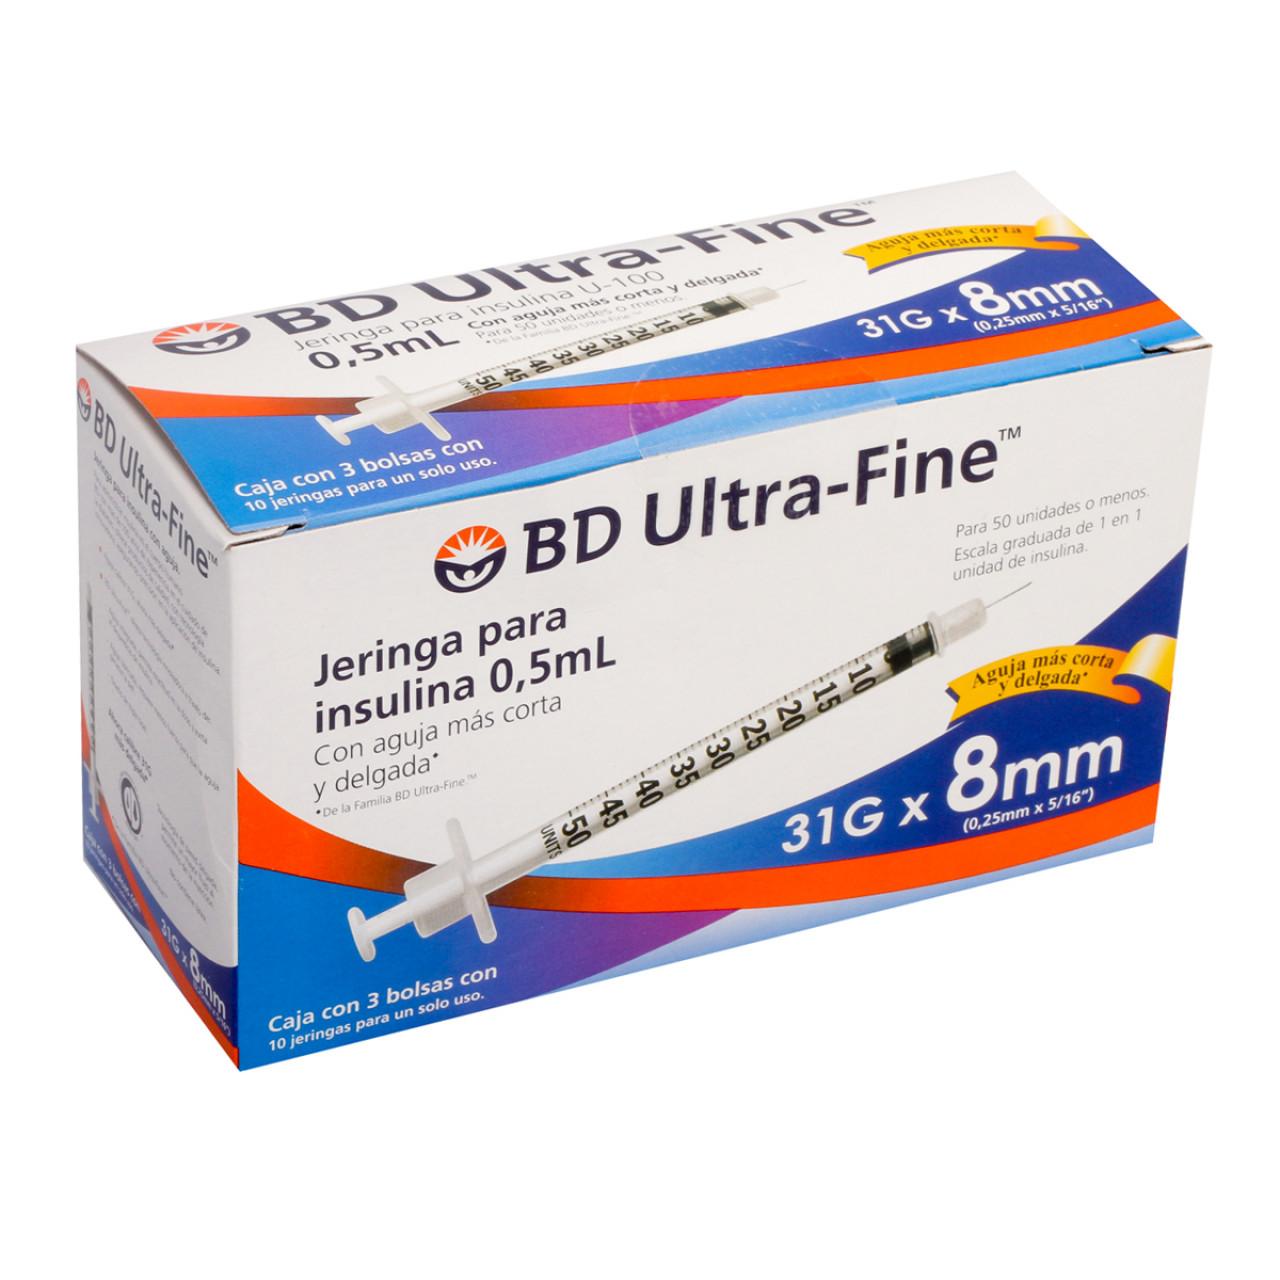 Comprar Jeringa Insulina Ultrafine 31G X 8Mm 3 Bolsas 10 Piezas 0.5 Ml